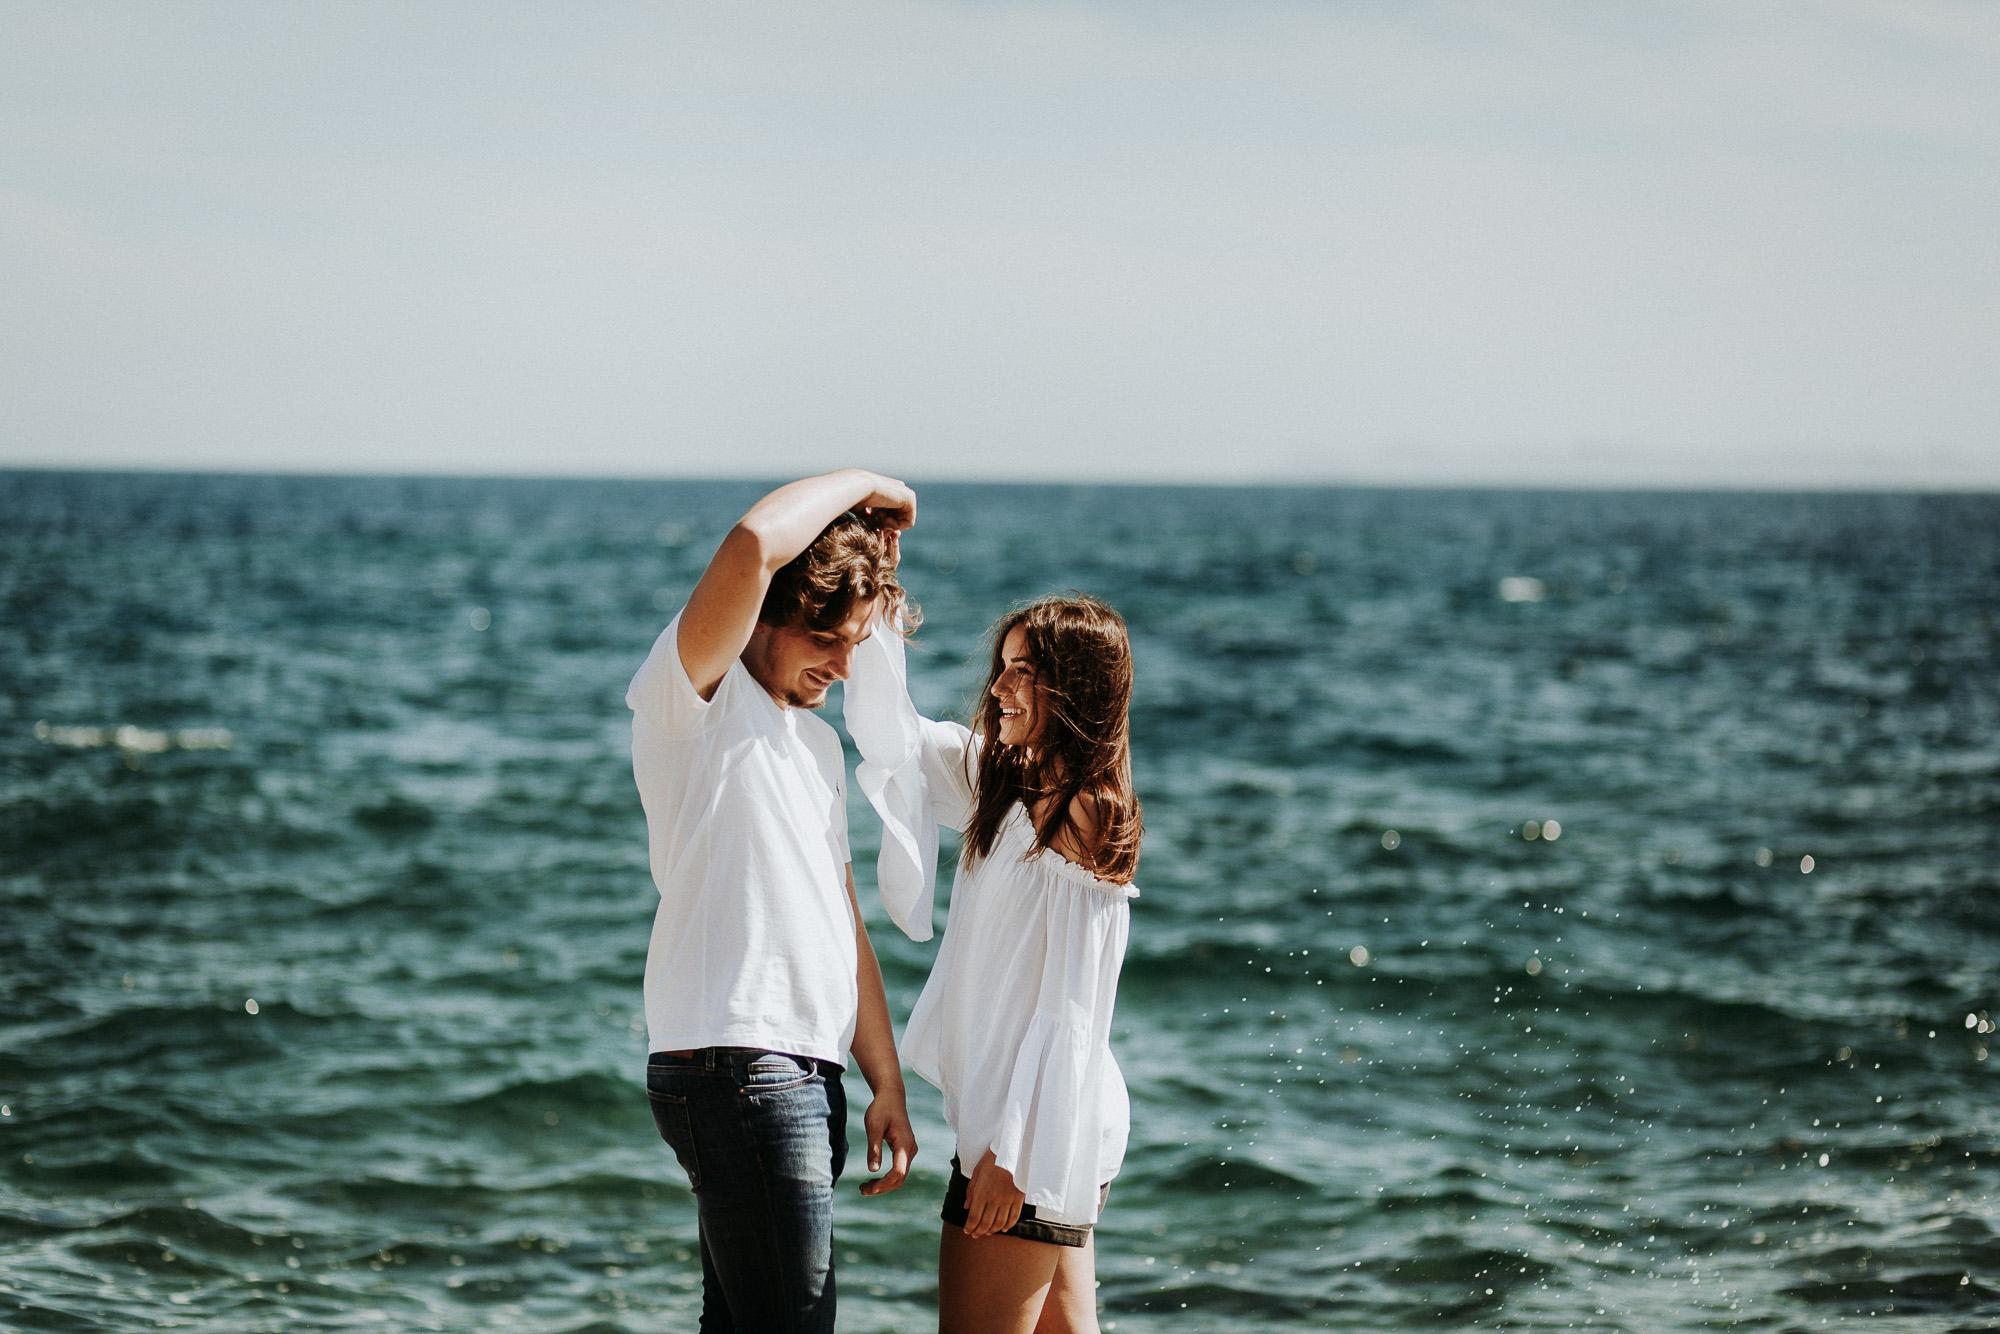 DanielaMarquardtPhotography_wedding_elopement_mallorca_spain_stjordi_sessalines_marinaandxavi173